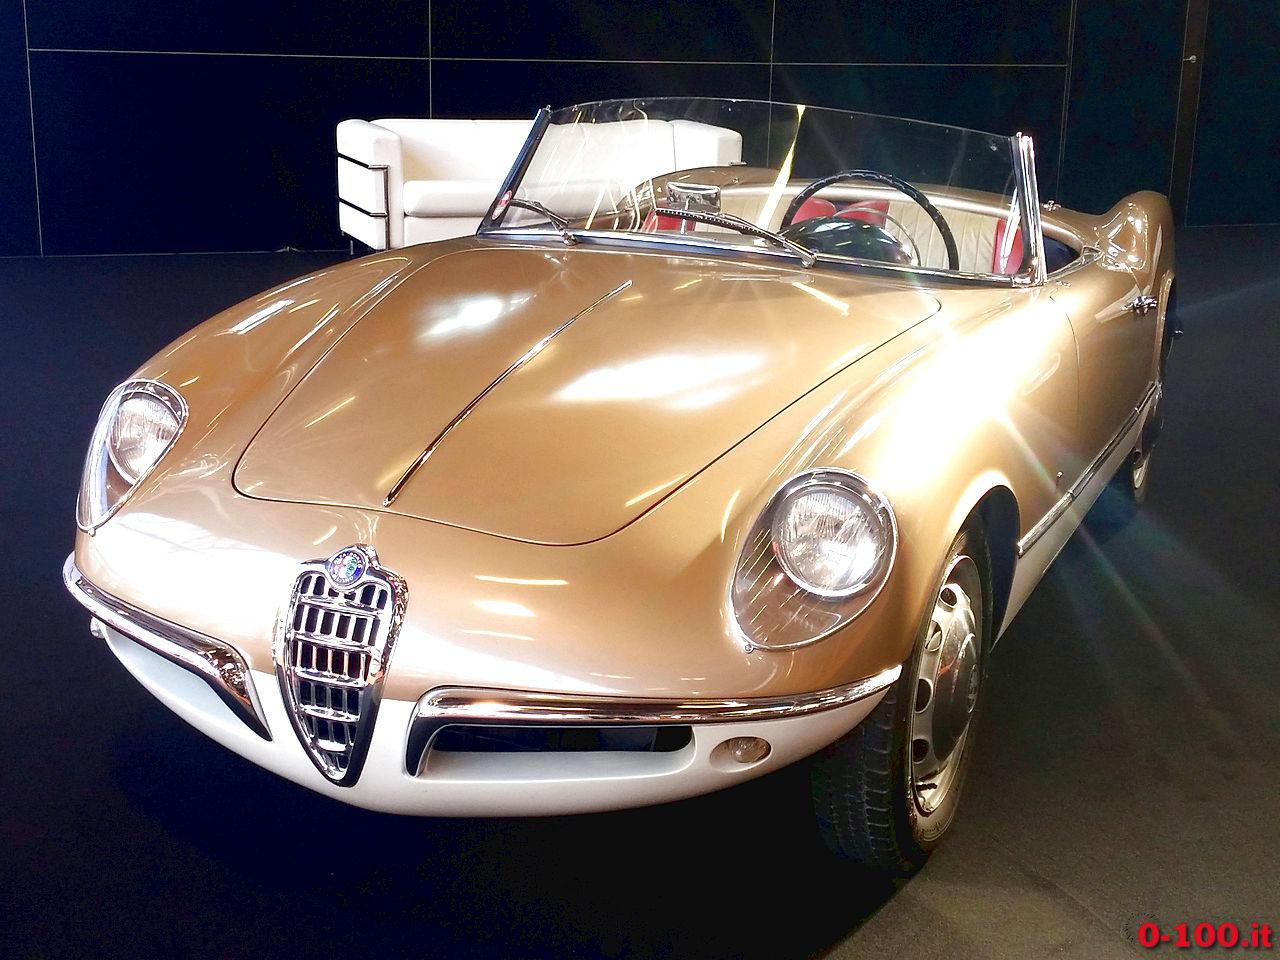 bologna-motor-show-2016_alfa-romeo-giulietta-spider-bertone-0-100_31